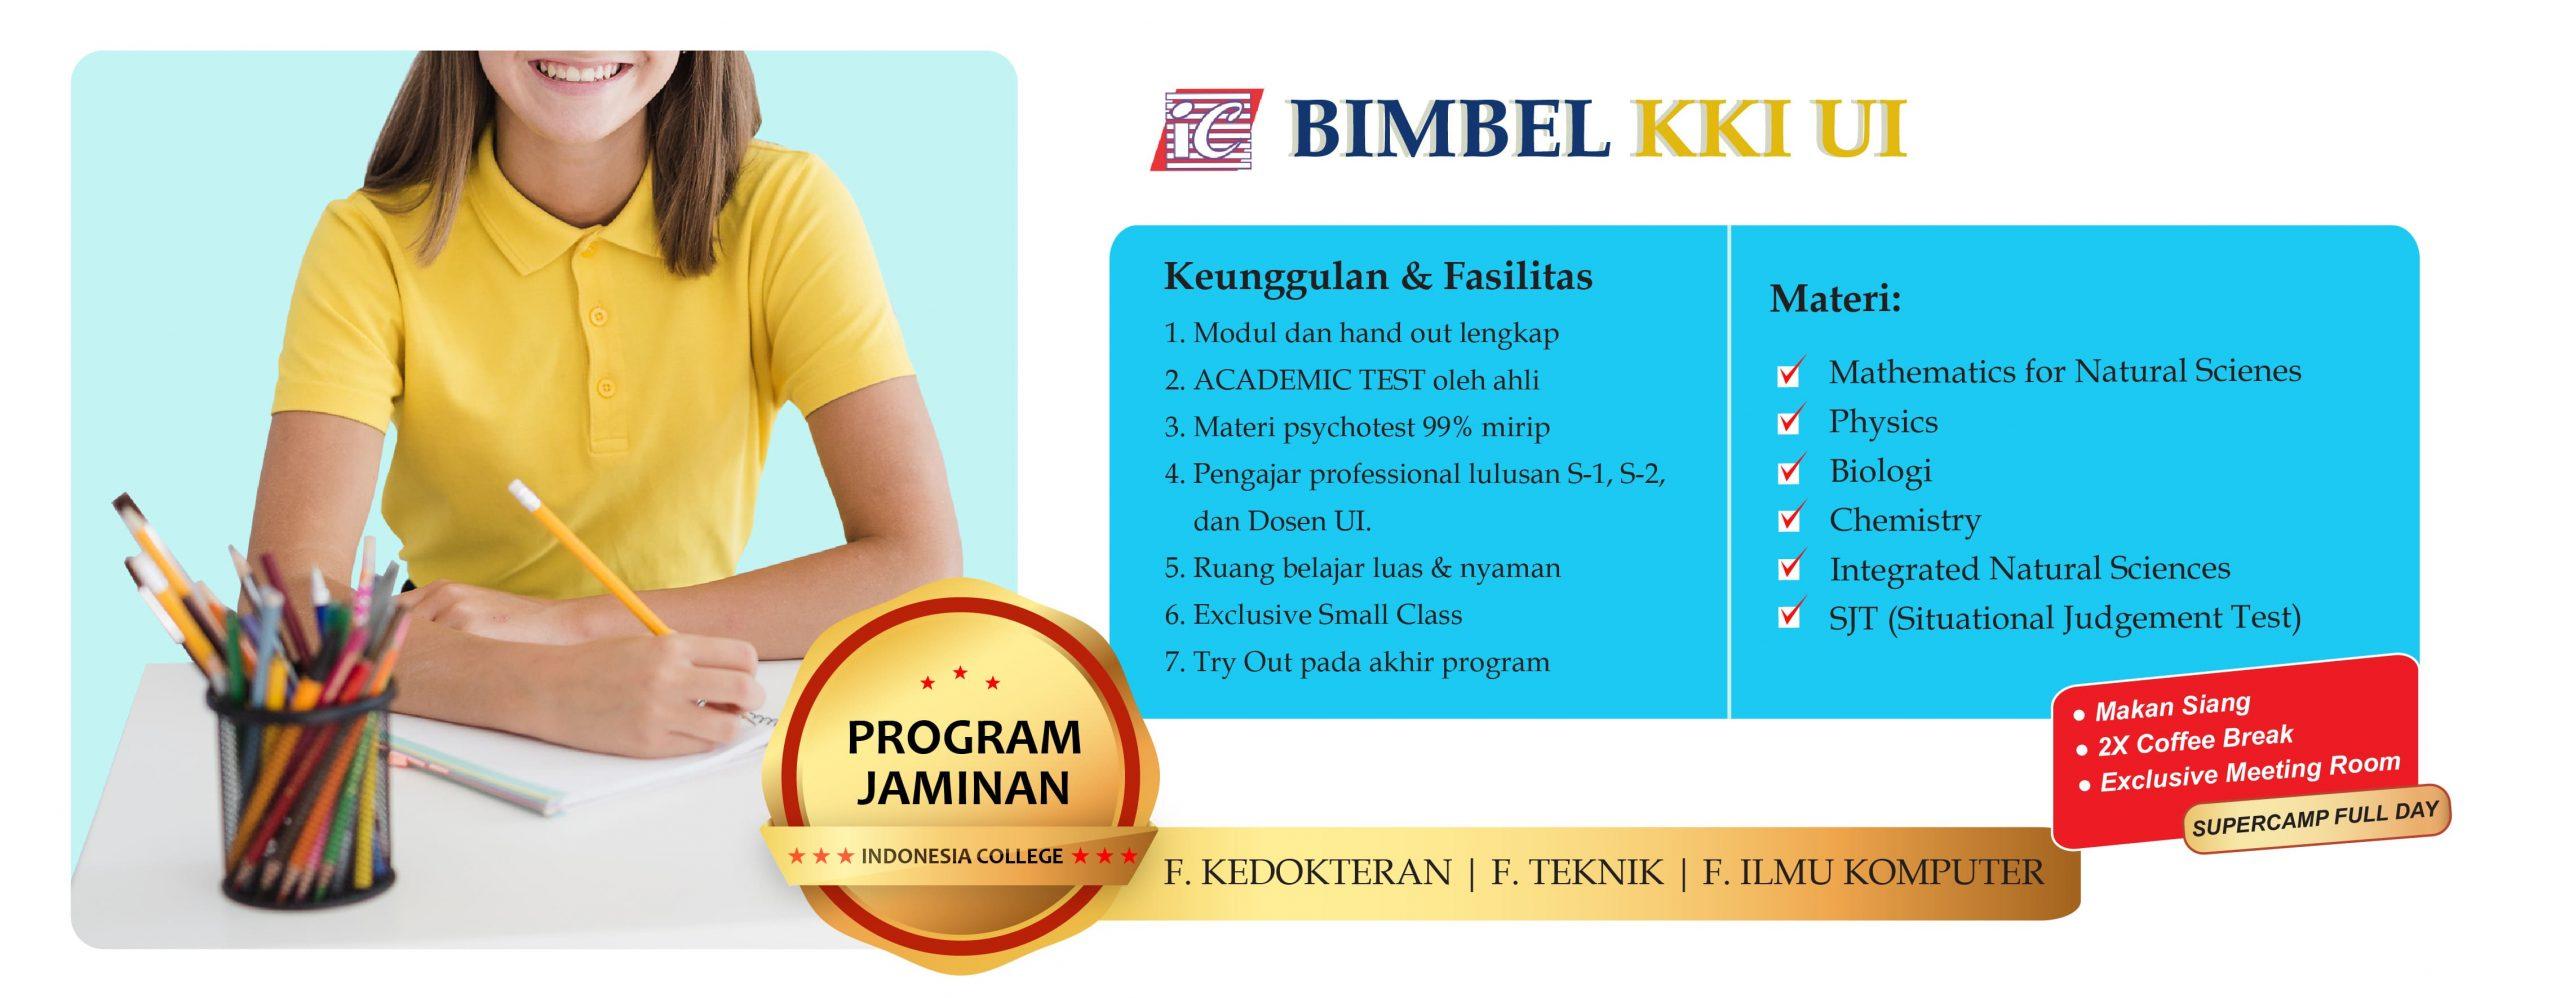 Bimbel-KKI-UI-2021